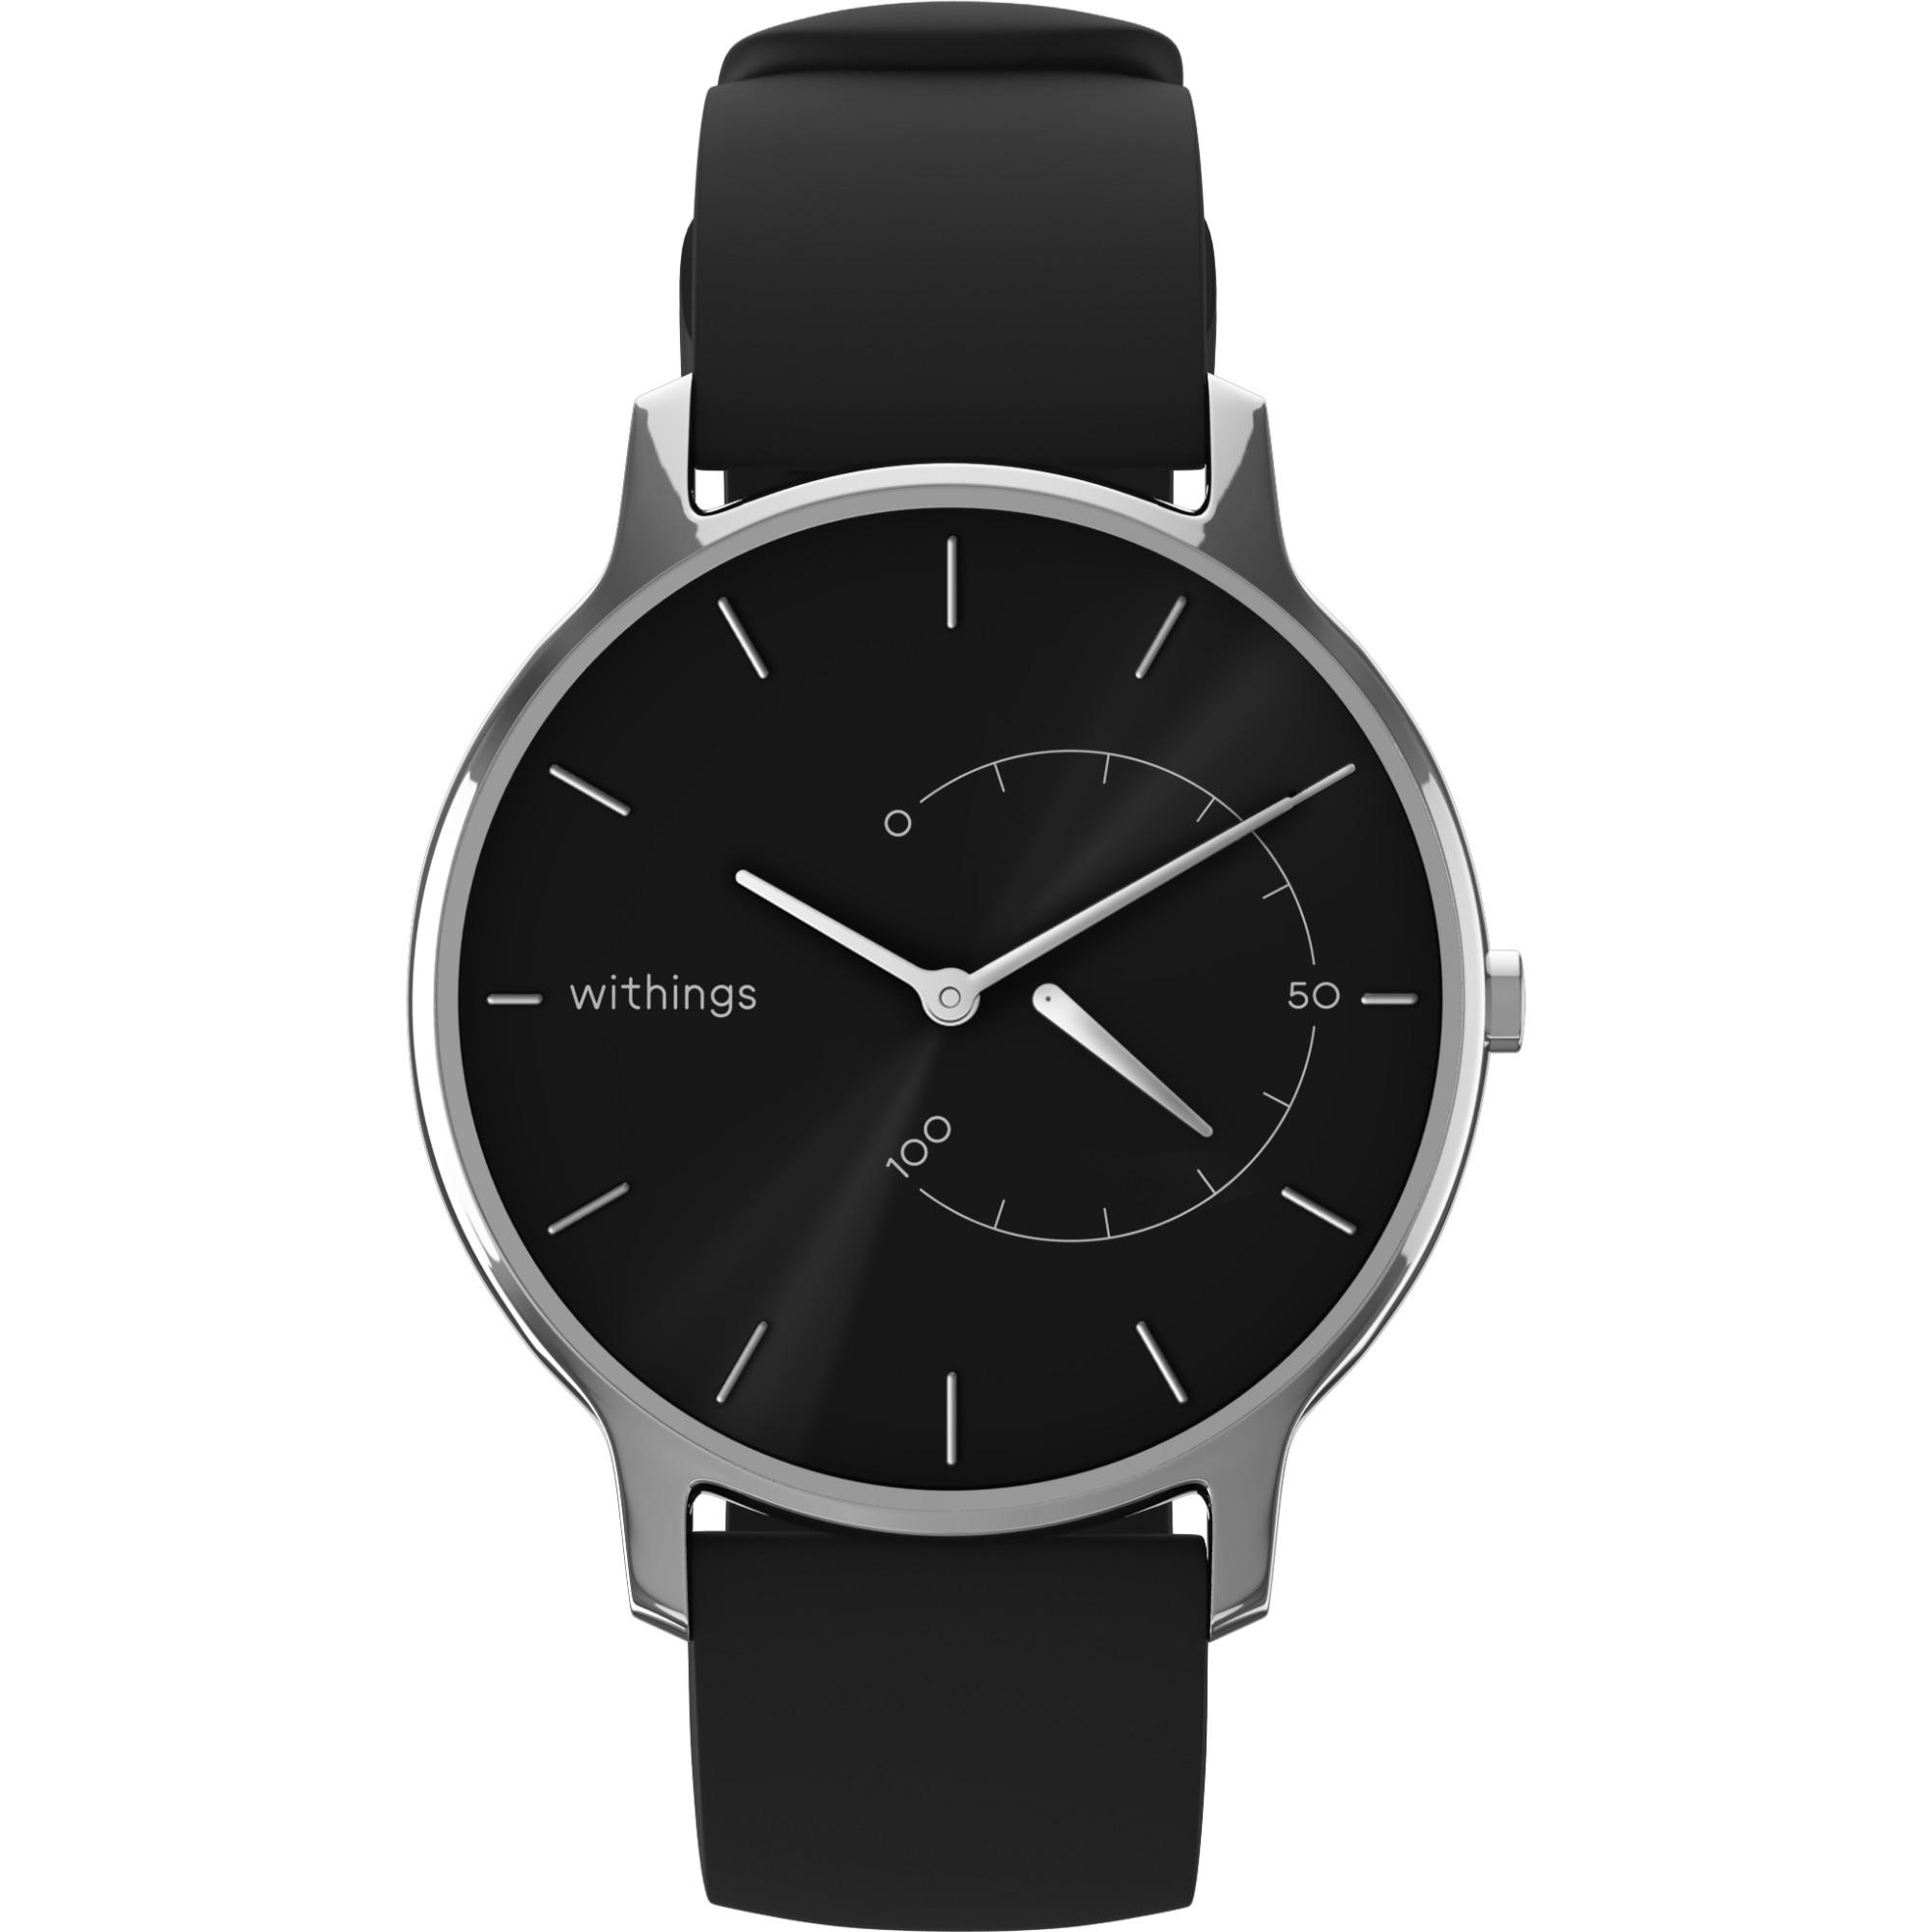 Fotografie Ceas smartwatch Withings Move Timeless, Negru/Argintiu